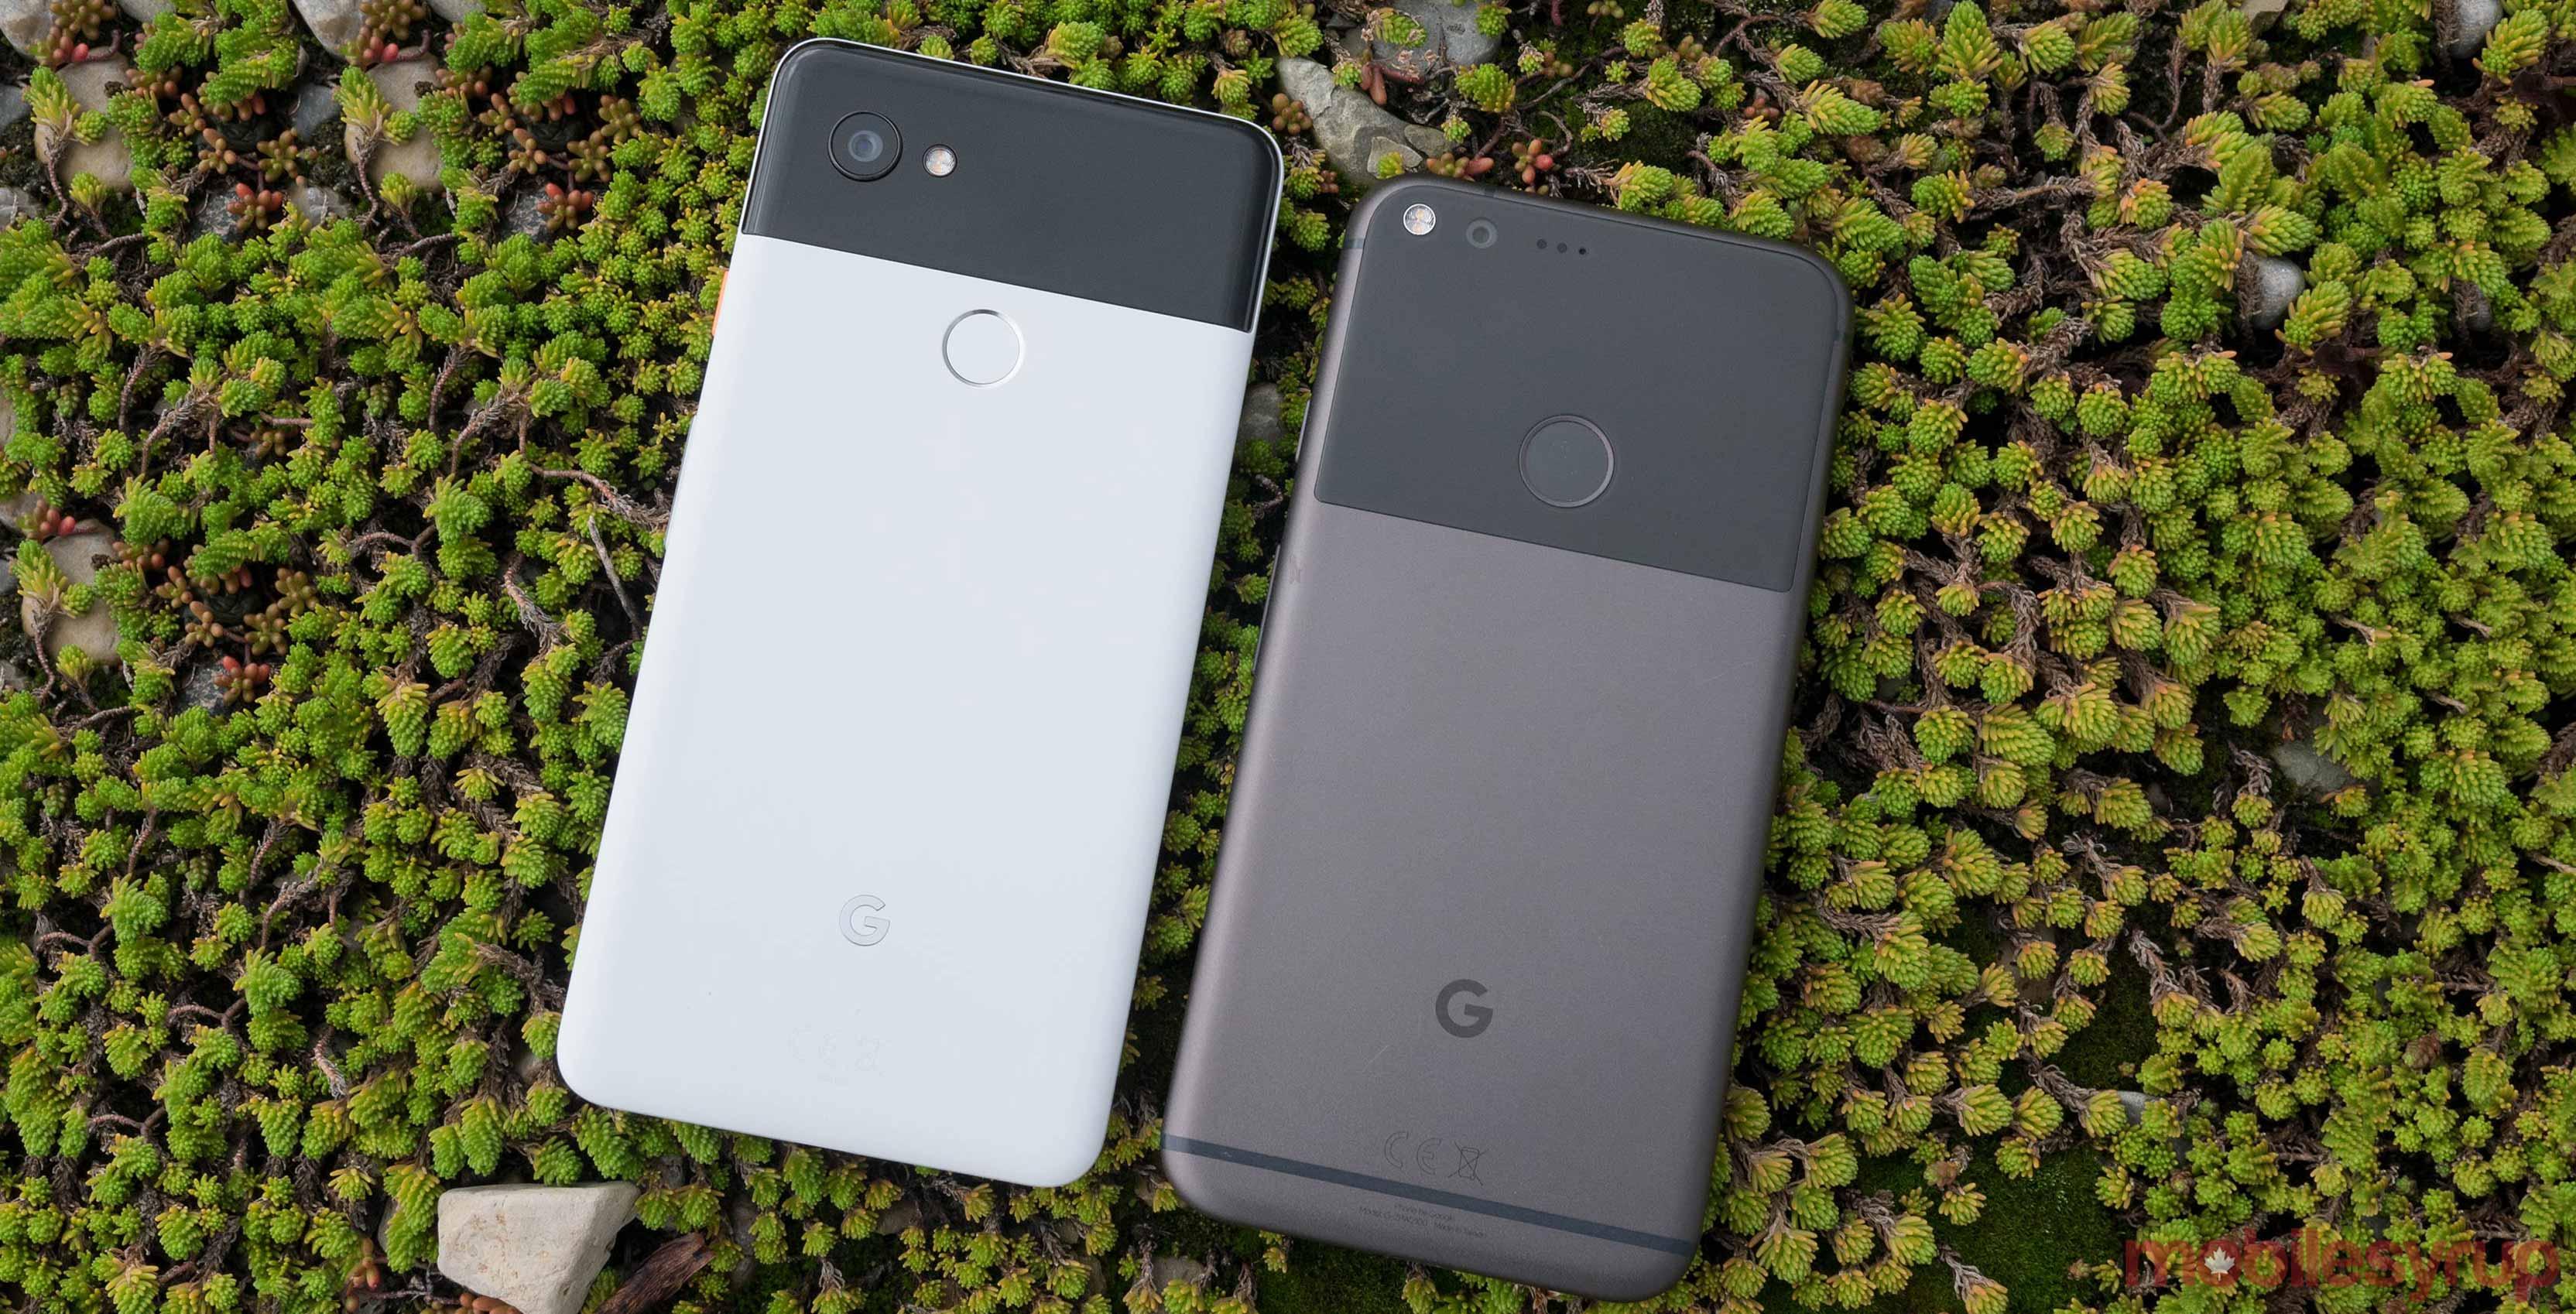 Pixel 2 XL and Pixel 2